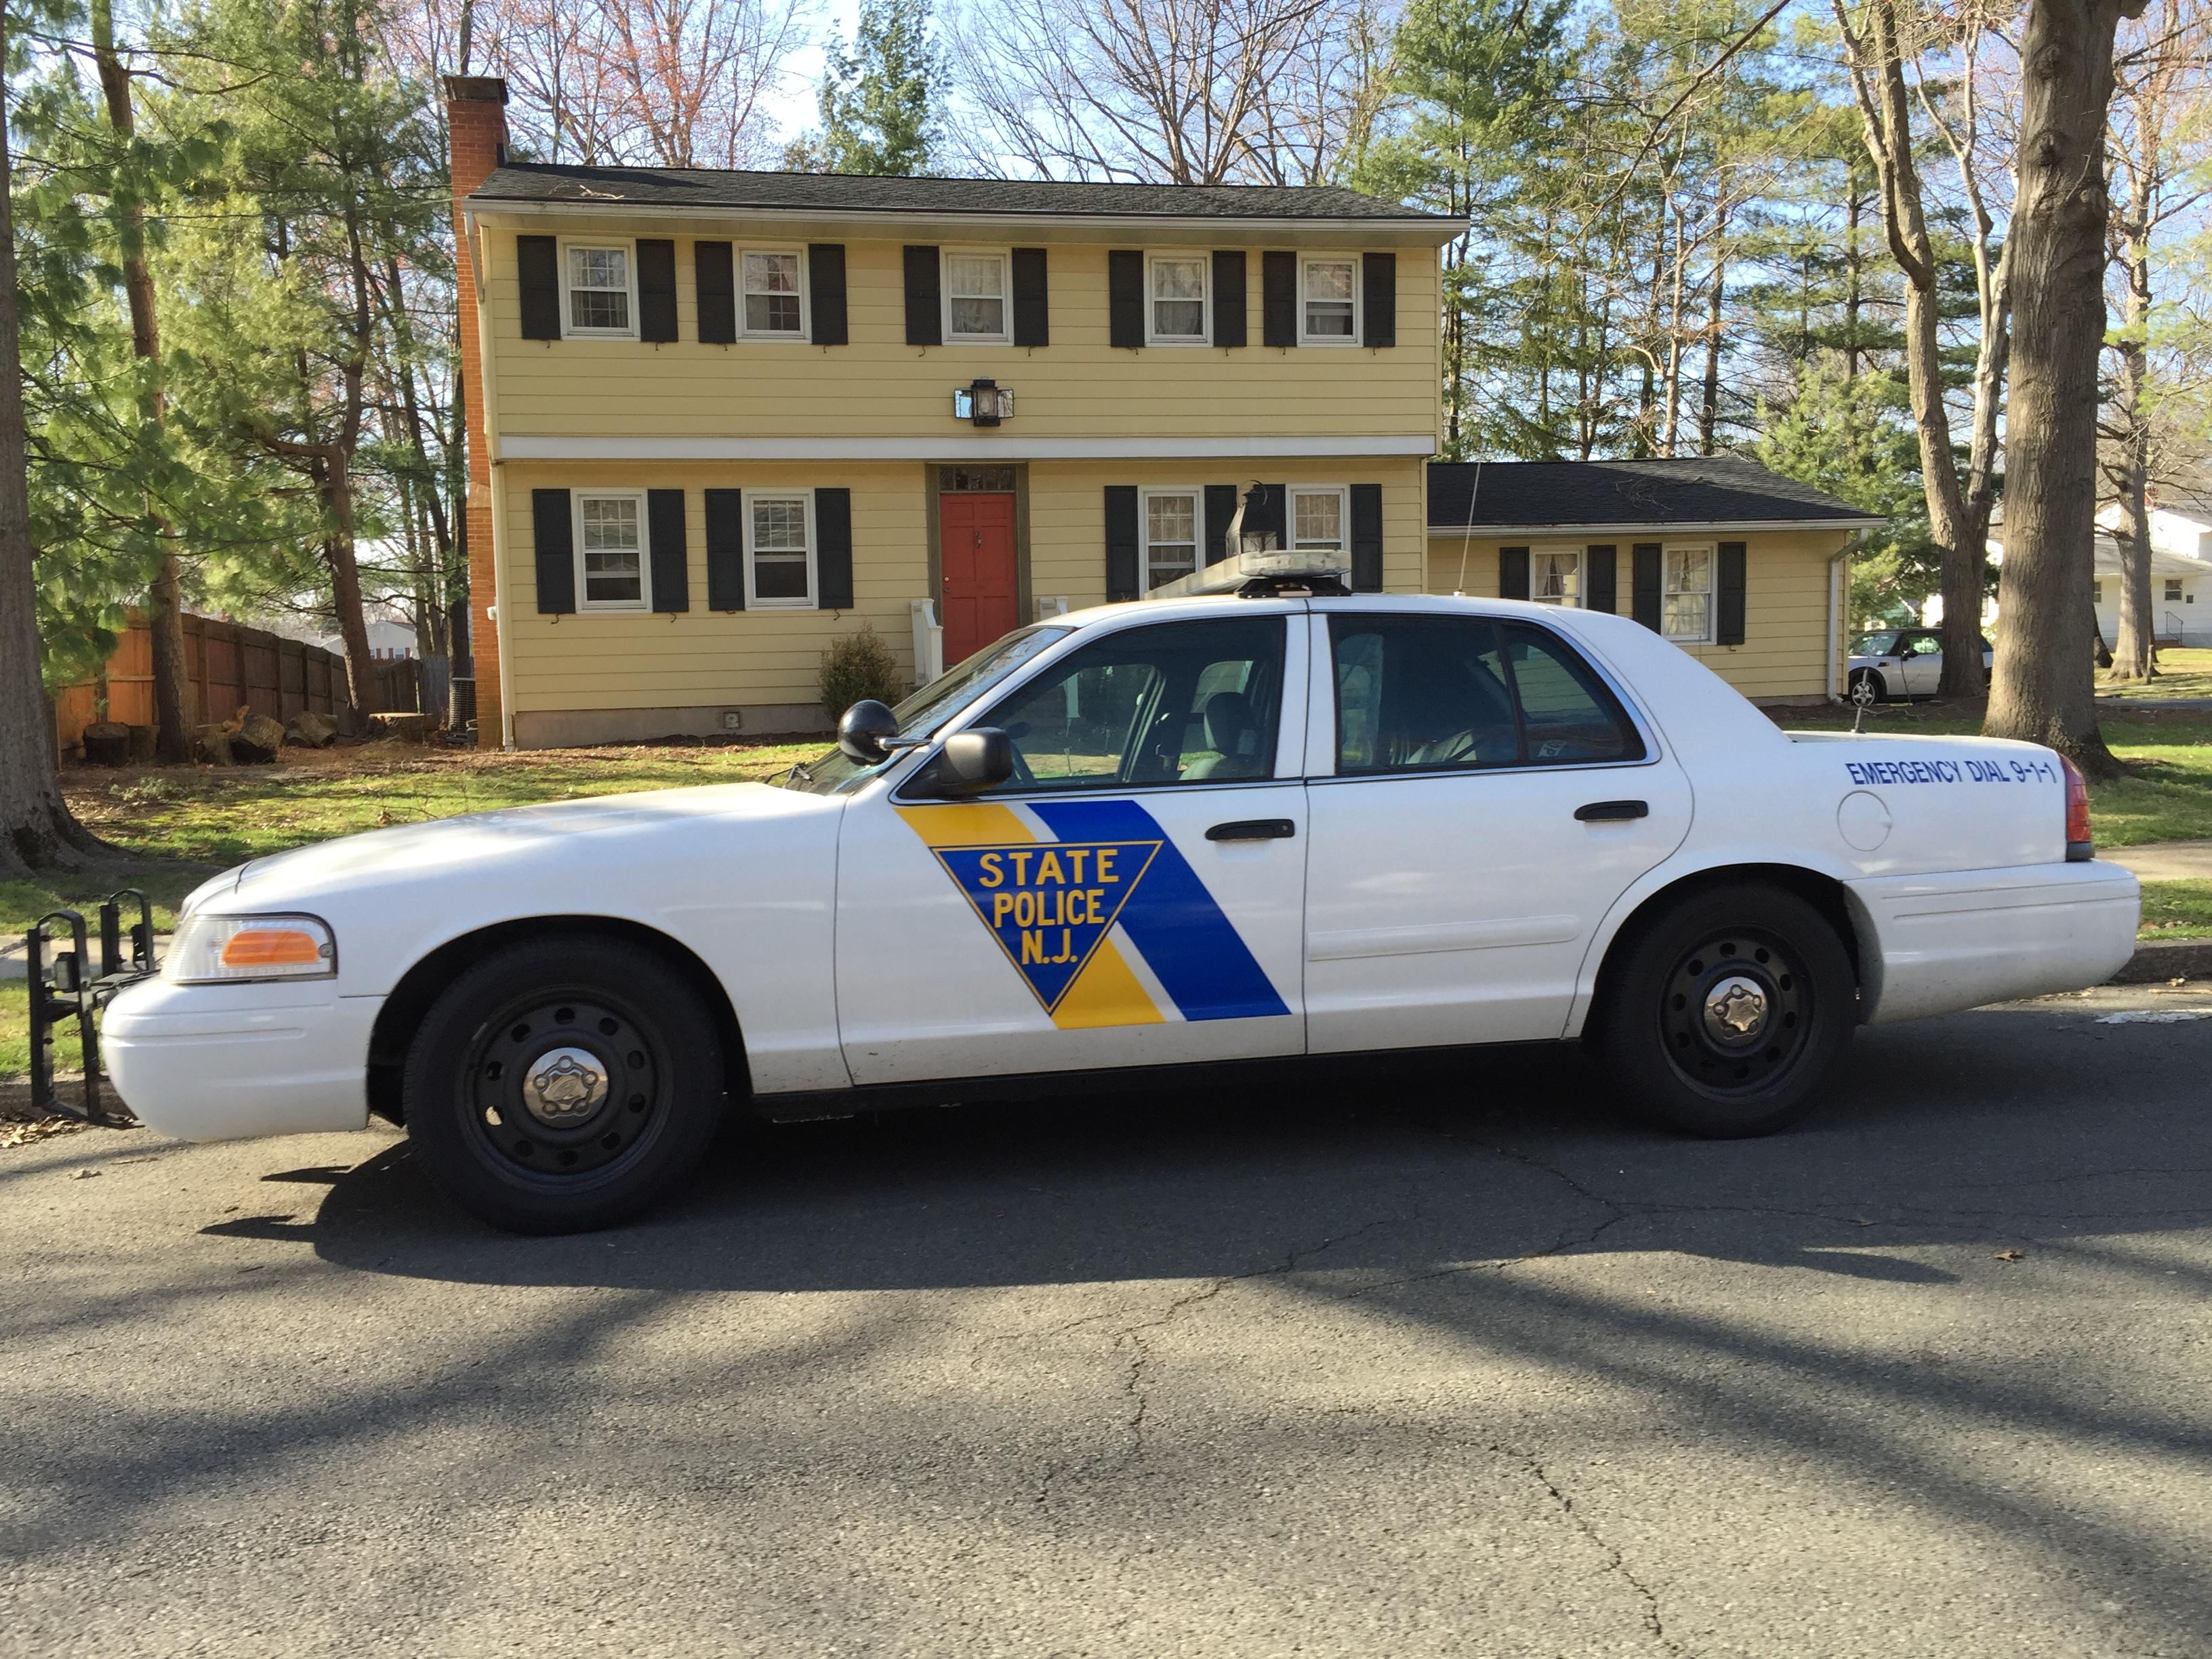 File 04 12 17 00 38 New Jersey State Trooper Patrol